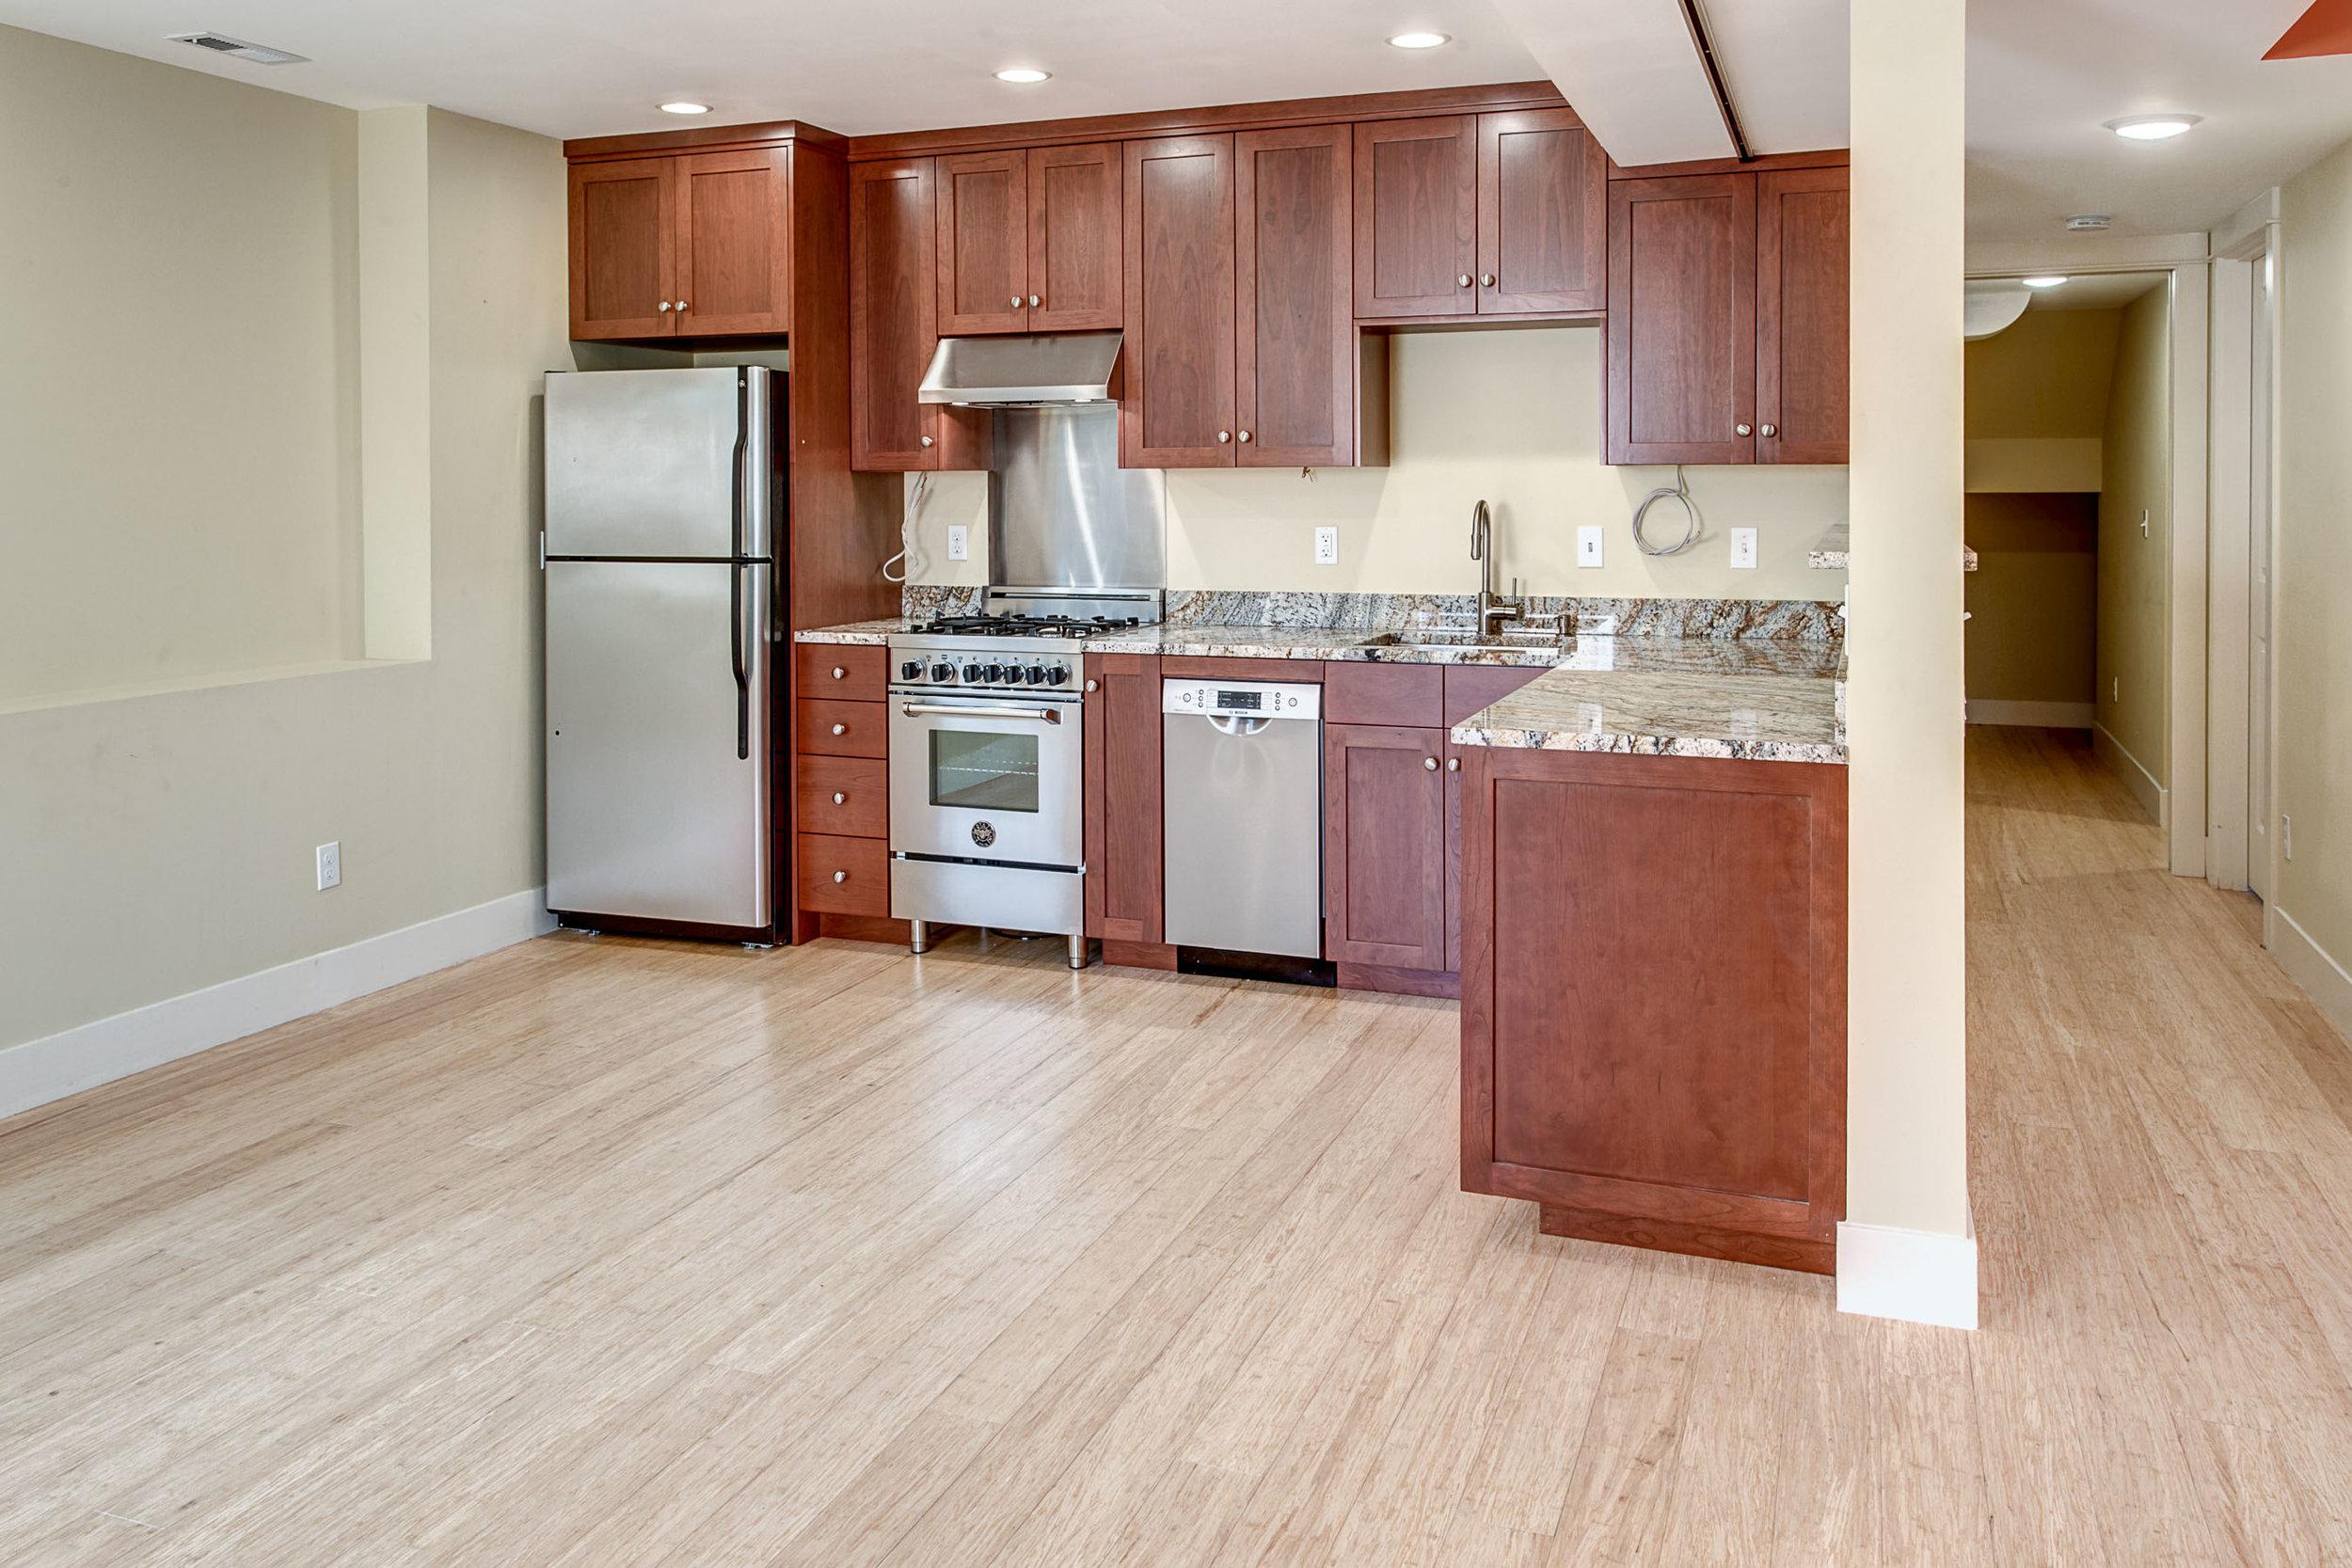 18-Apartment01.jpg